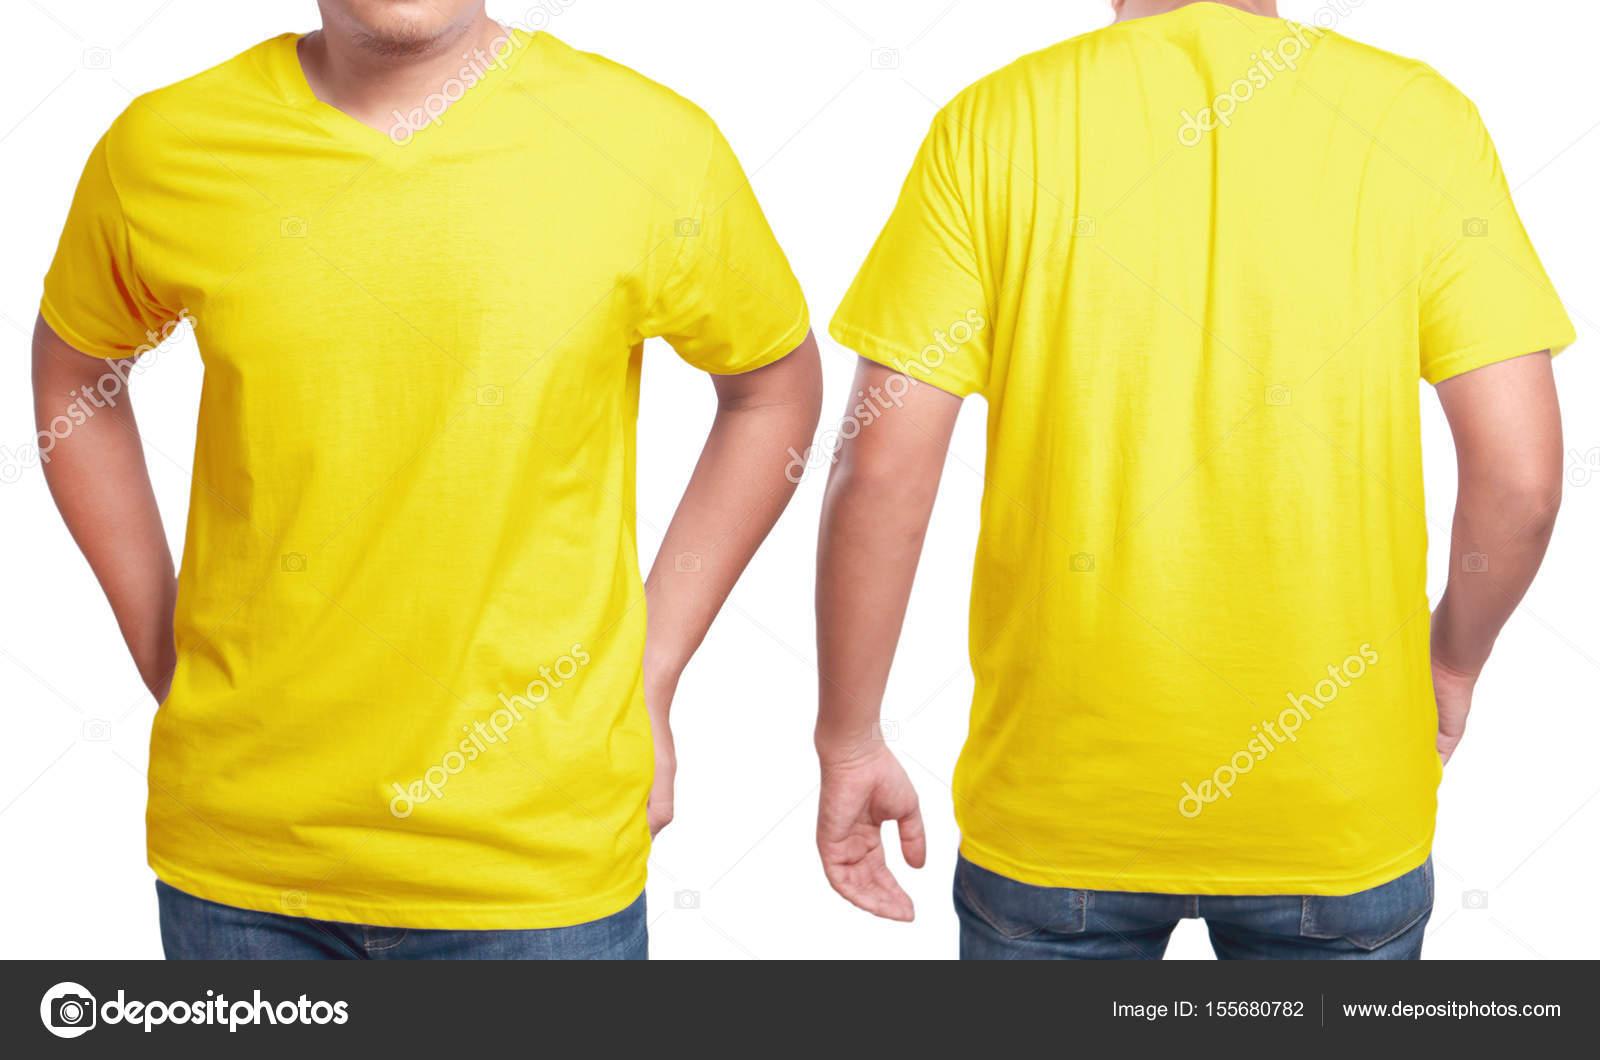 Gelbe v-Neck-Shirt-Design-Vorlage — Stockfoto © airdone #155680782